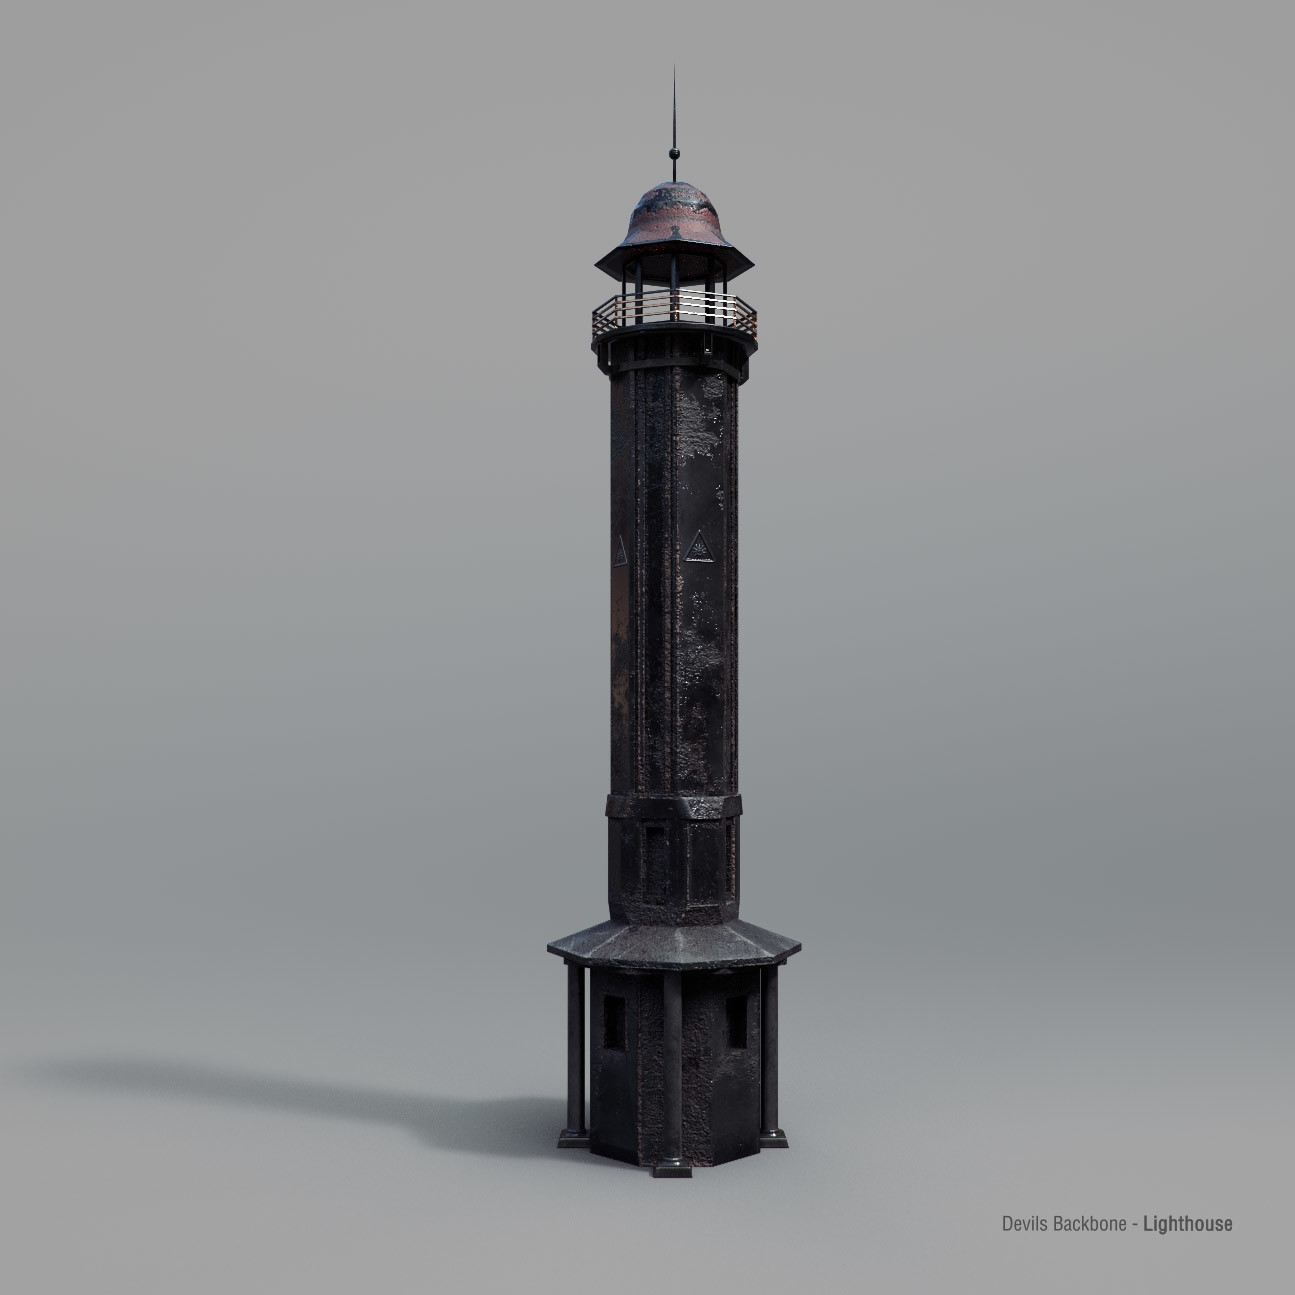 Patrick martinez devils backbone lighthouse